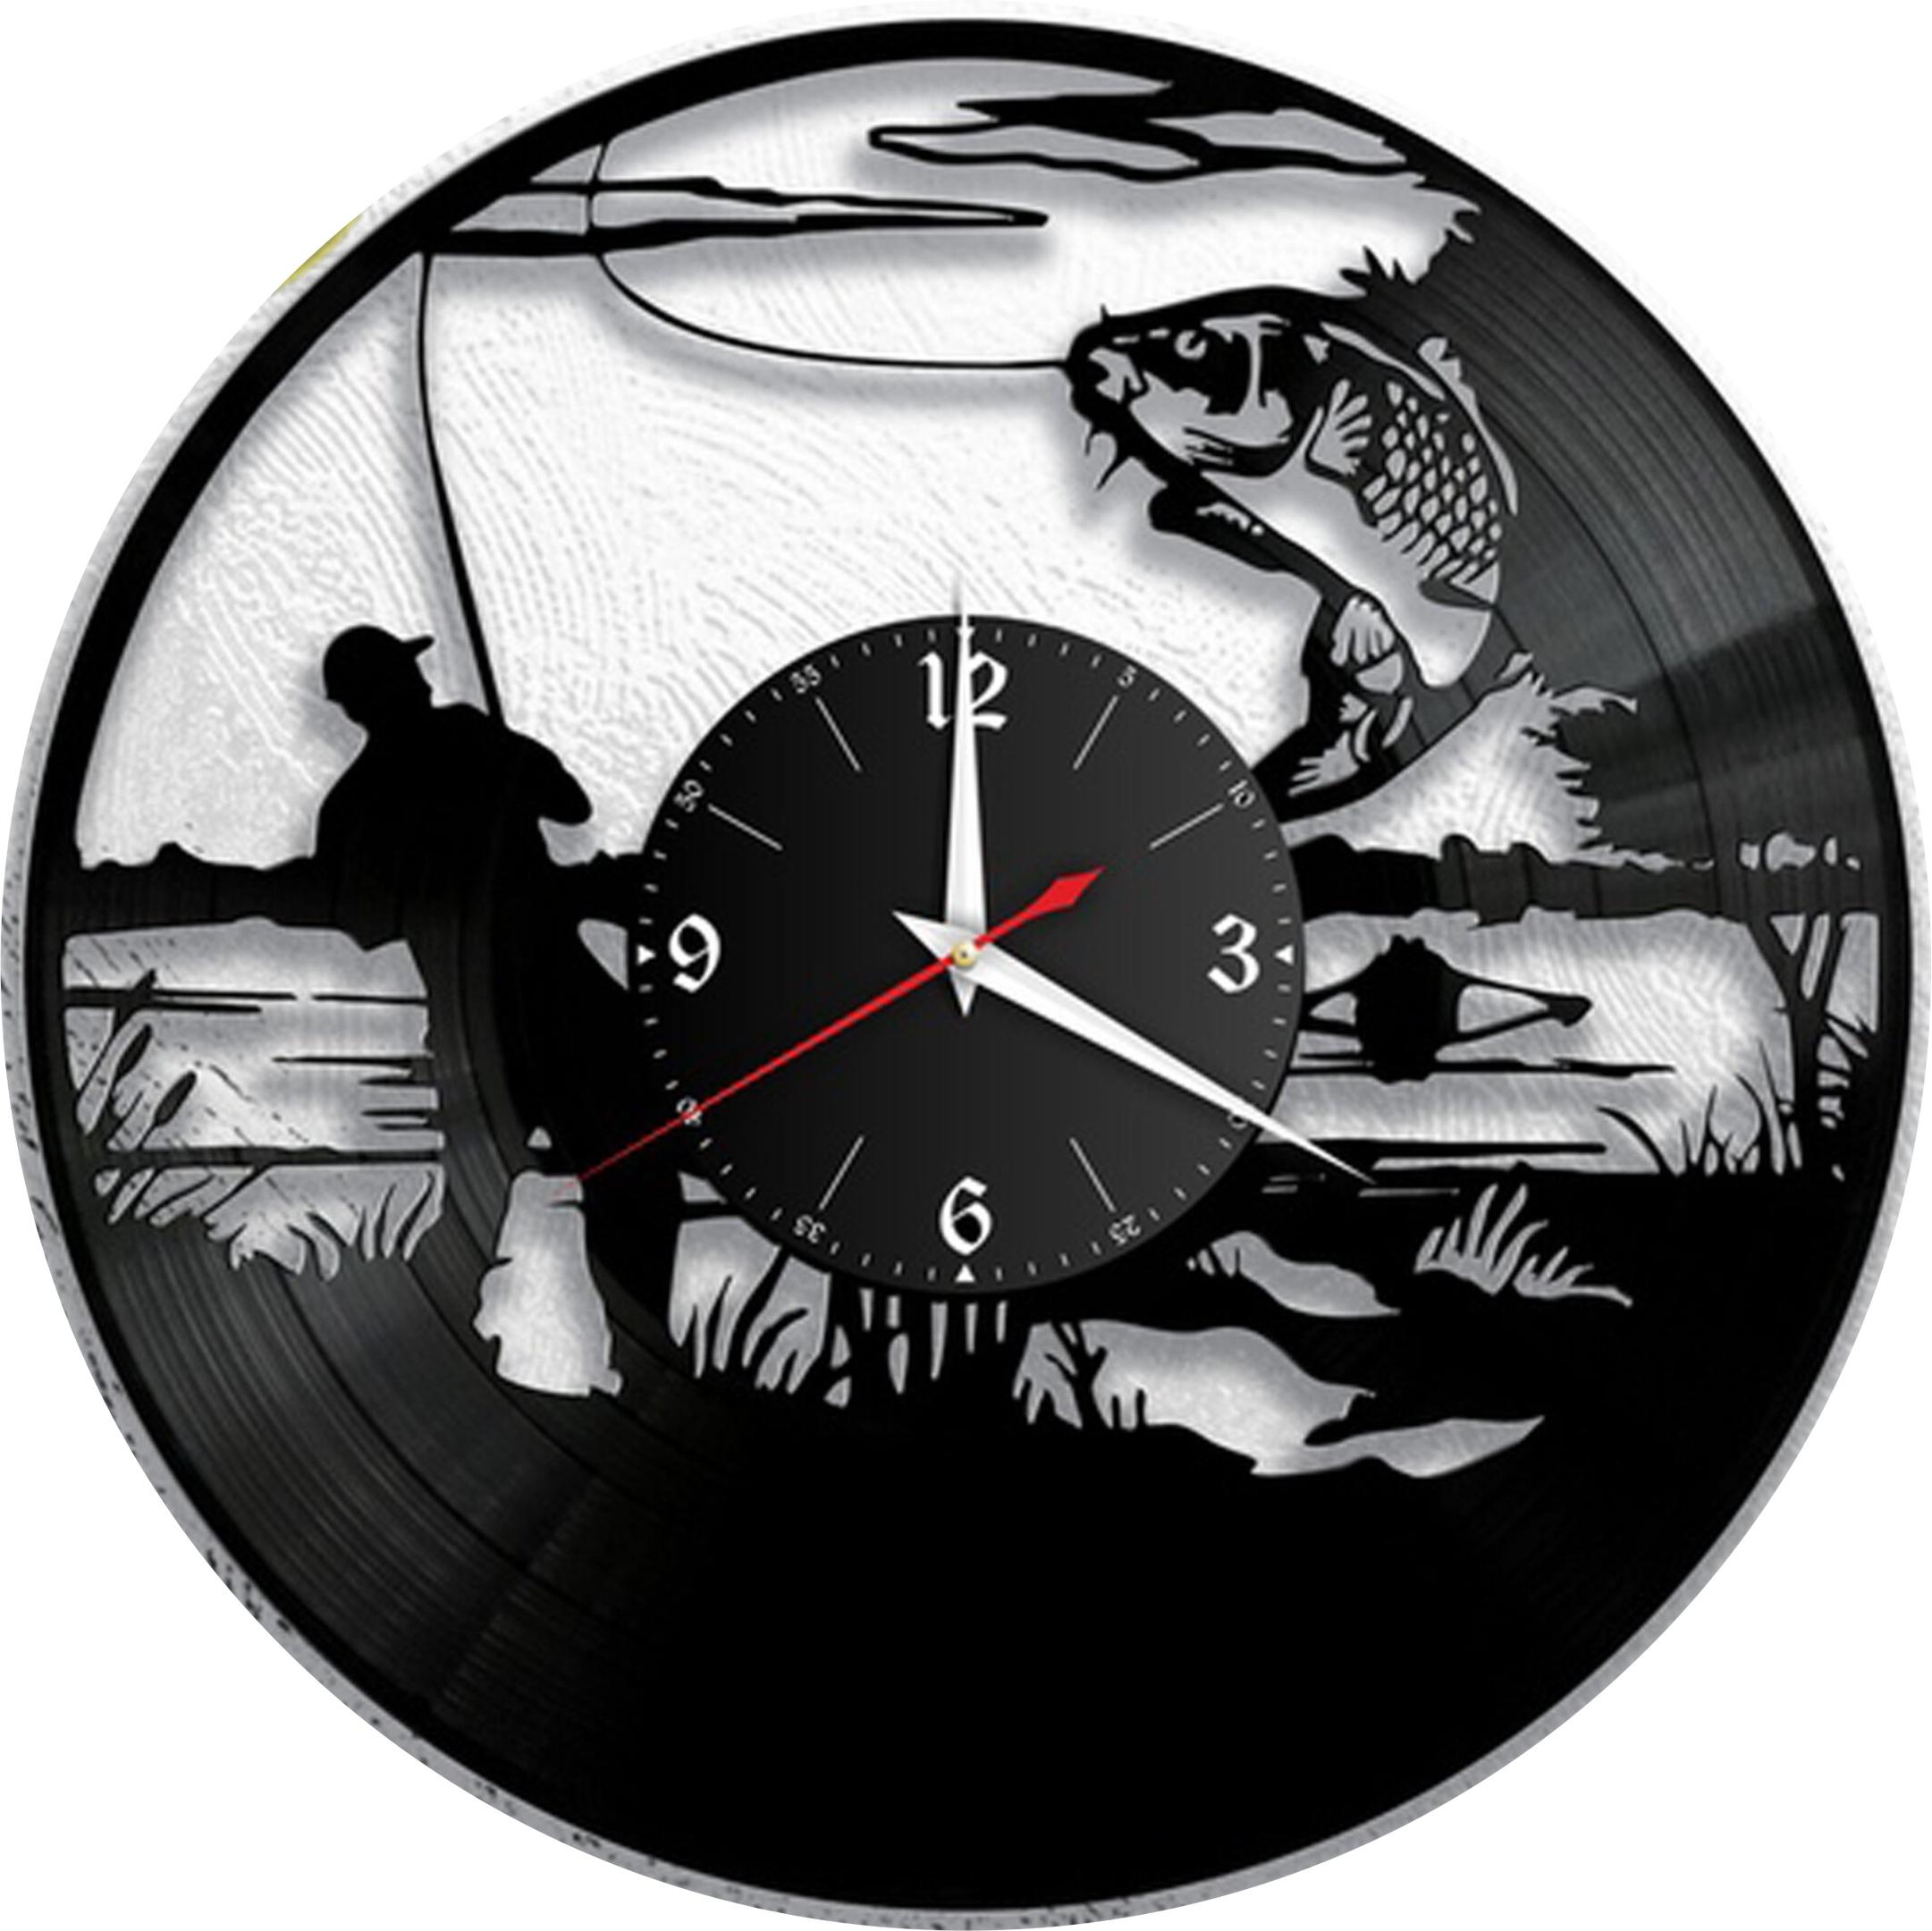 Laser Cut Fishing Vinyl Wall Clock Fisherman Men Dad Father Gift DXF File